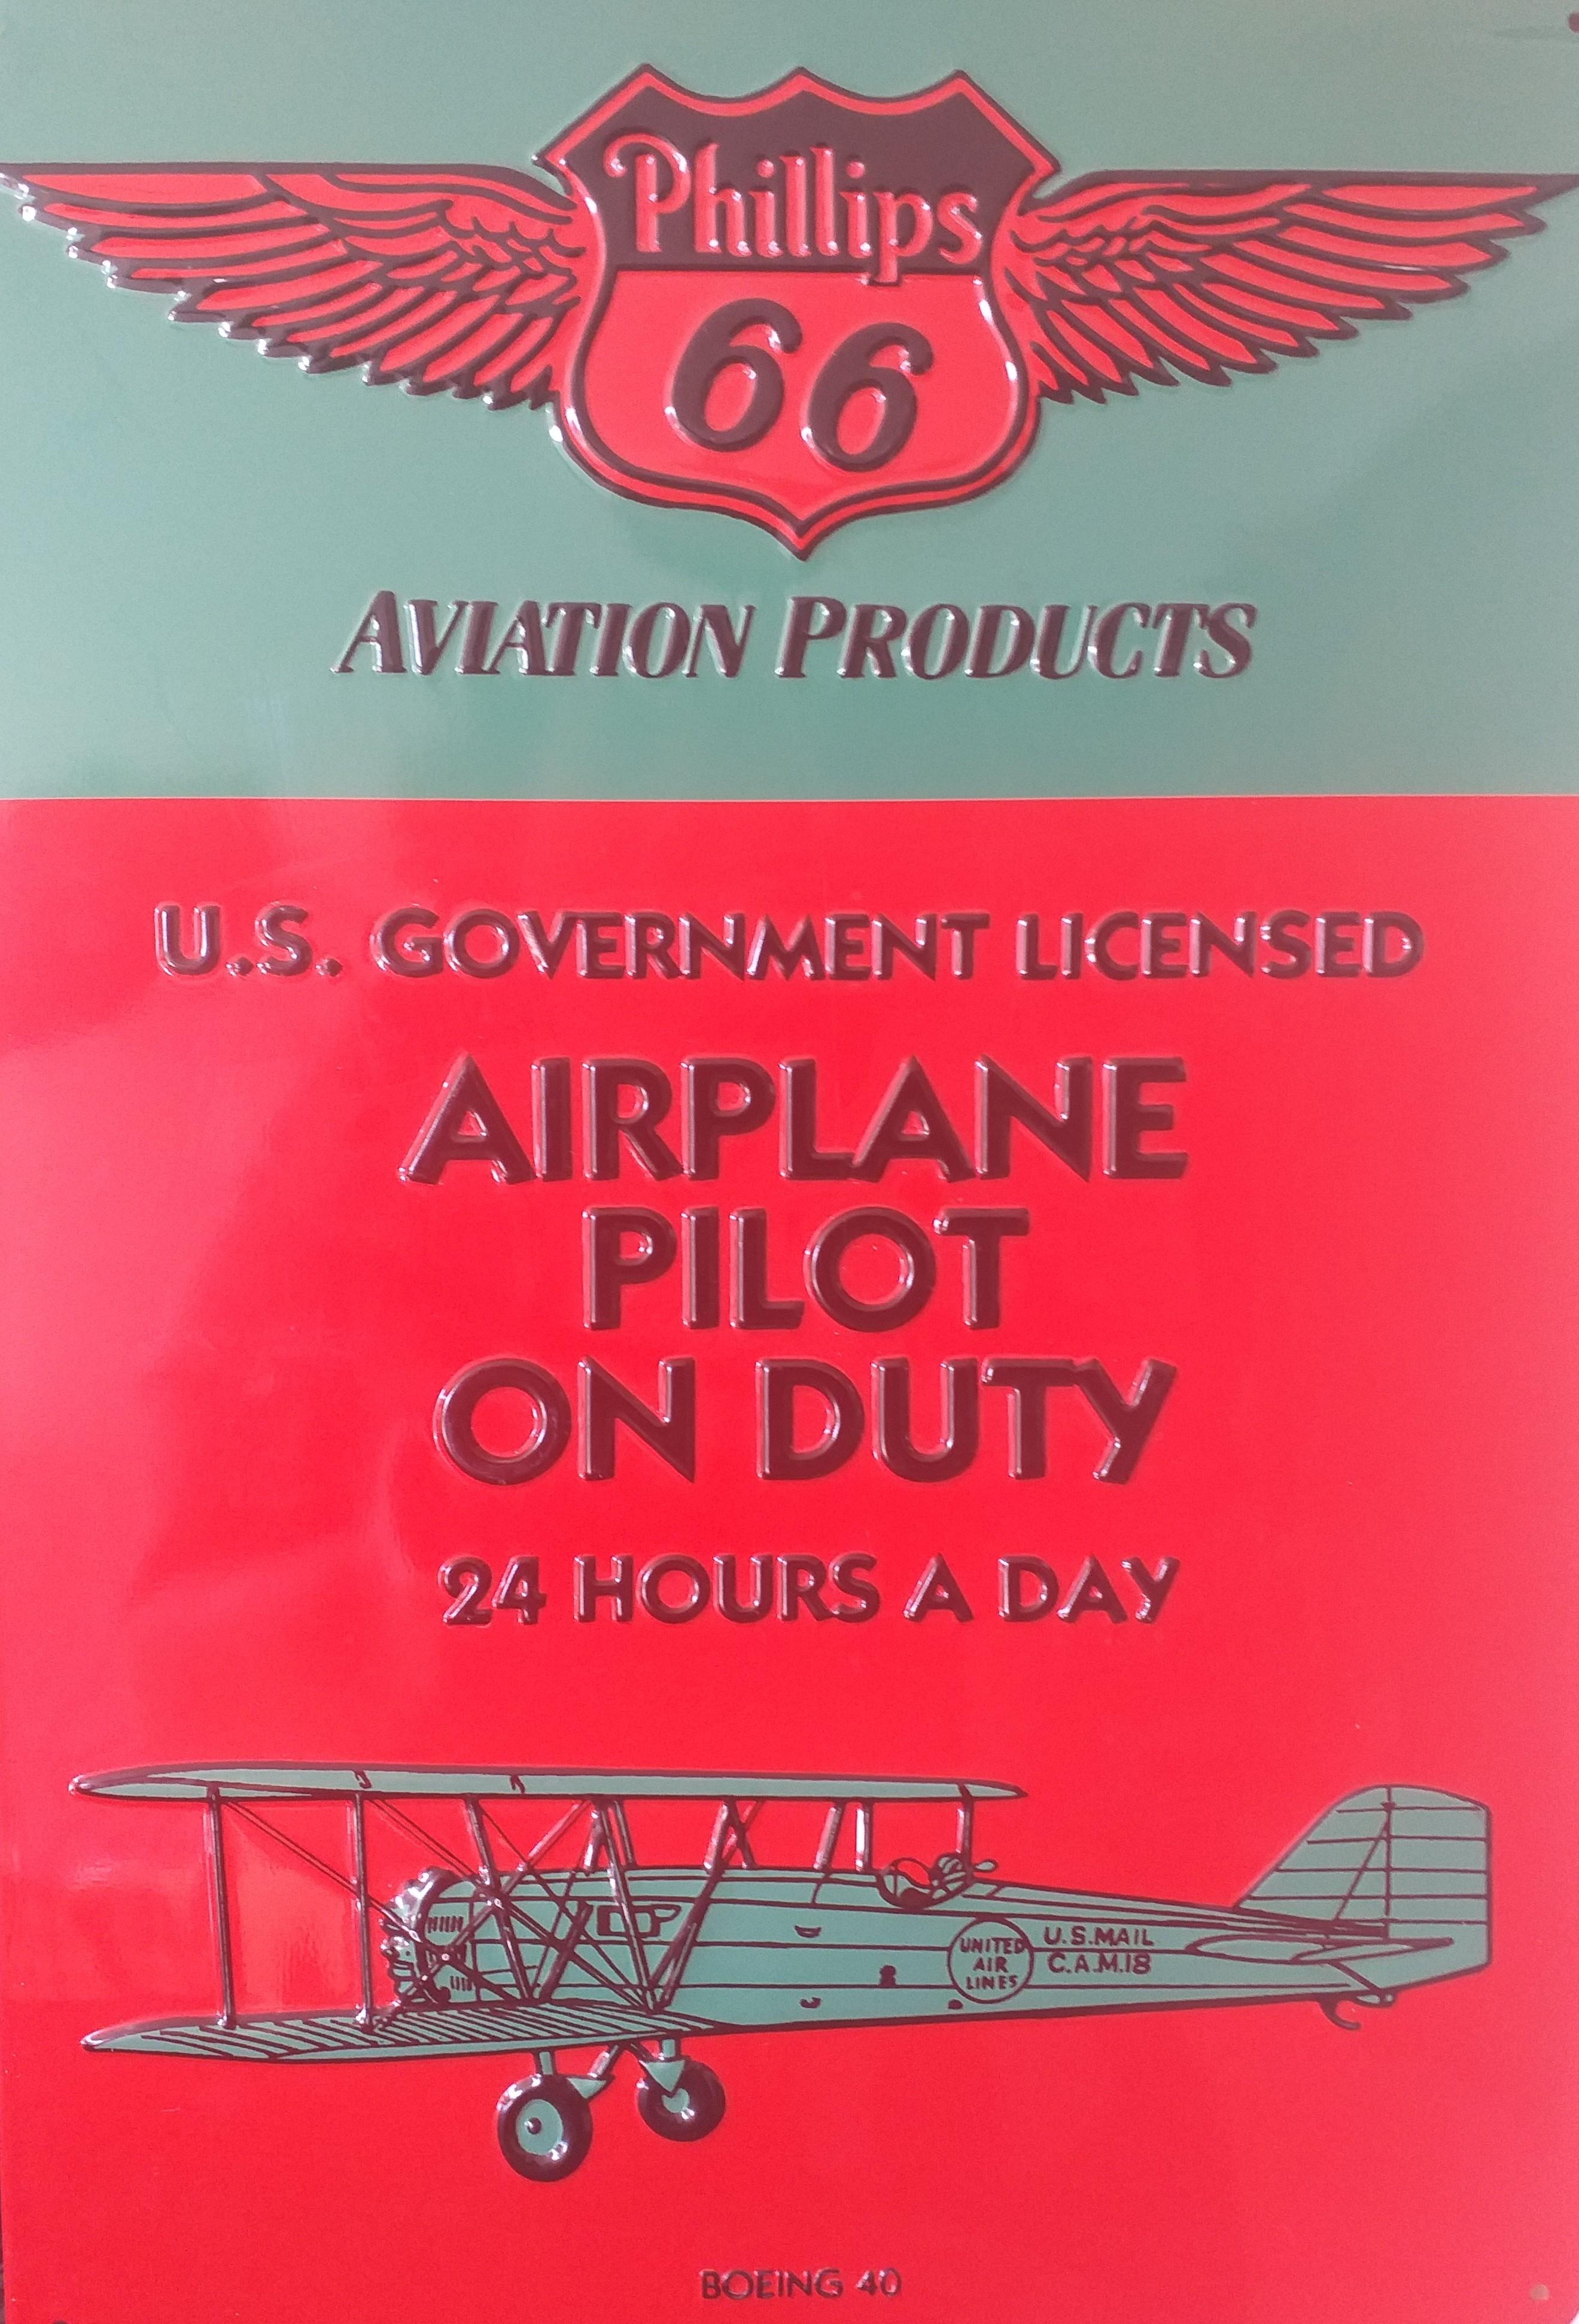 Letrero de metal ¨ AIRPLANE PILOT ON DUTY¨